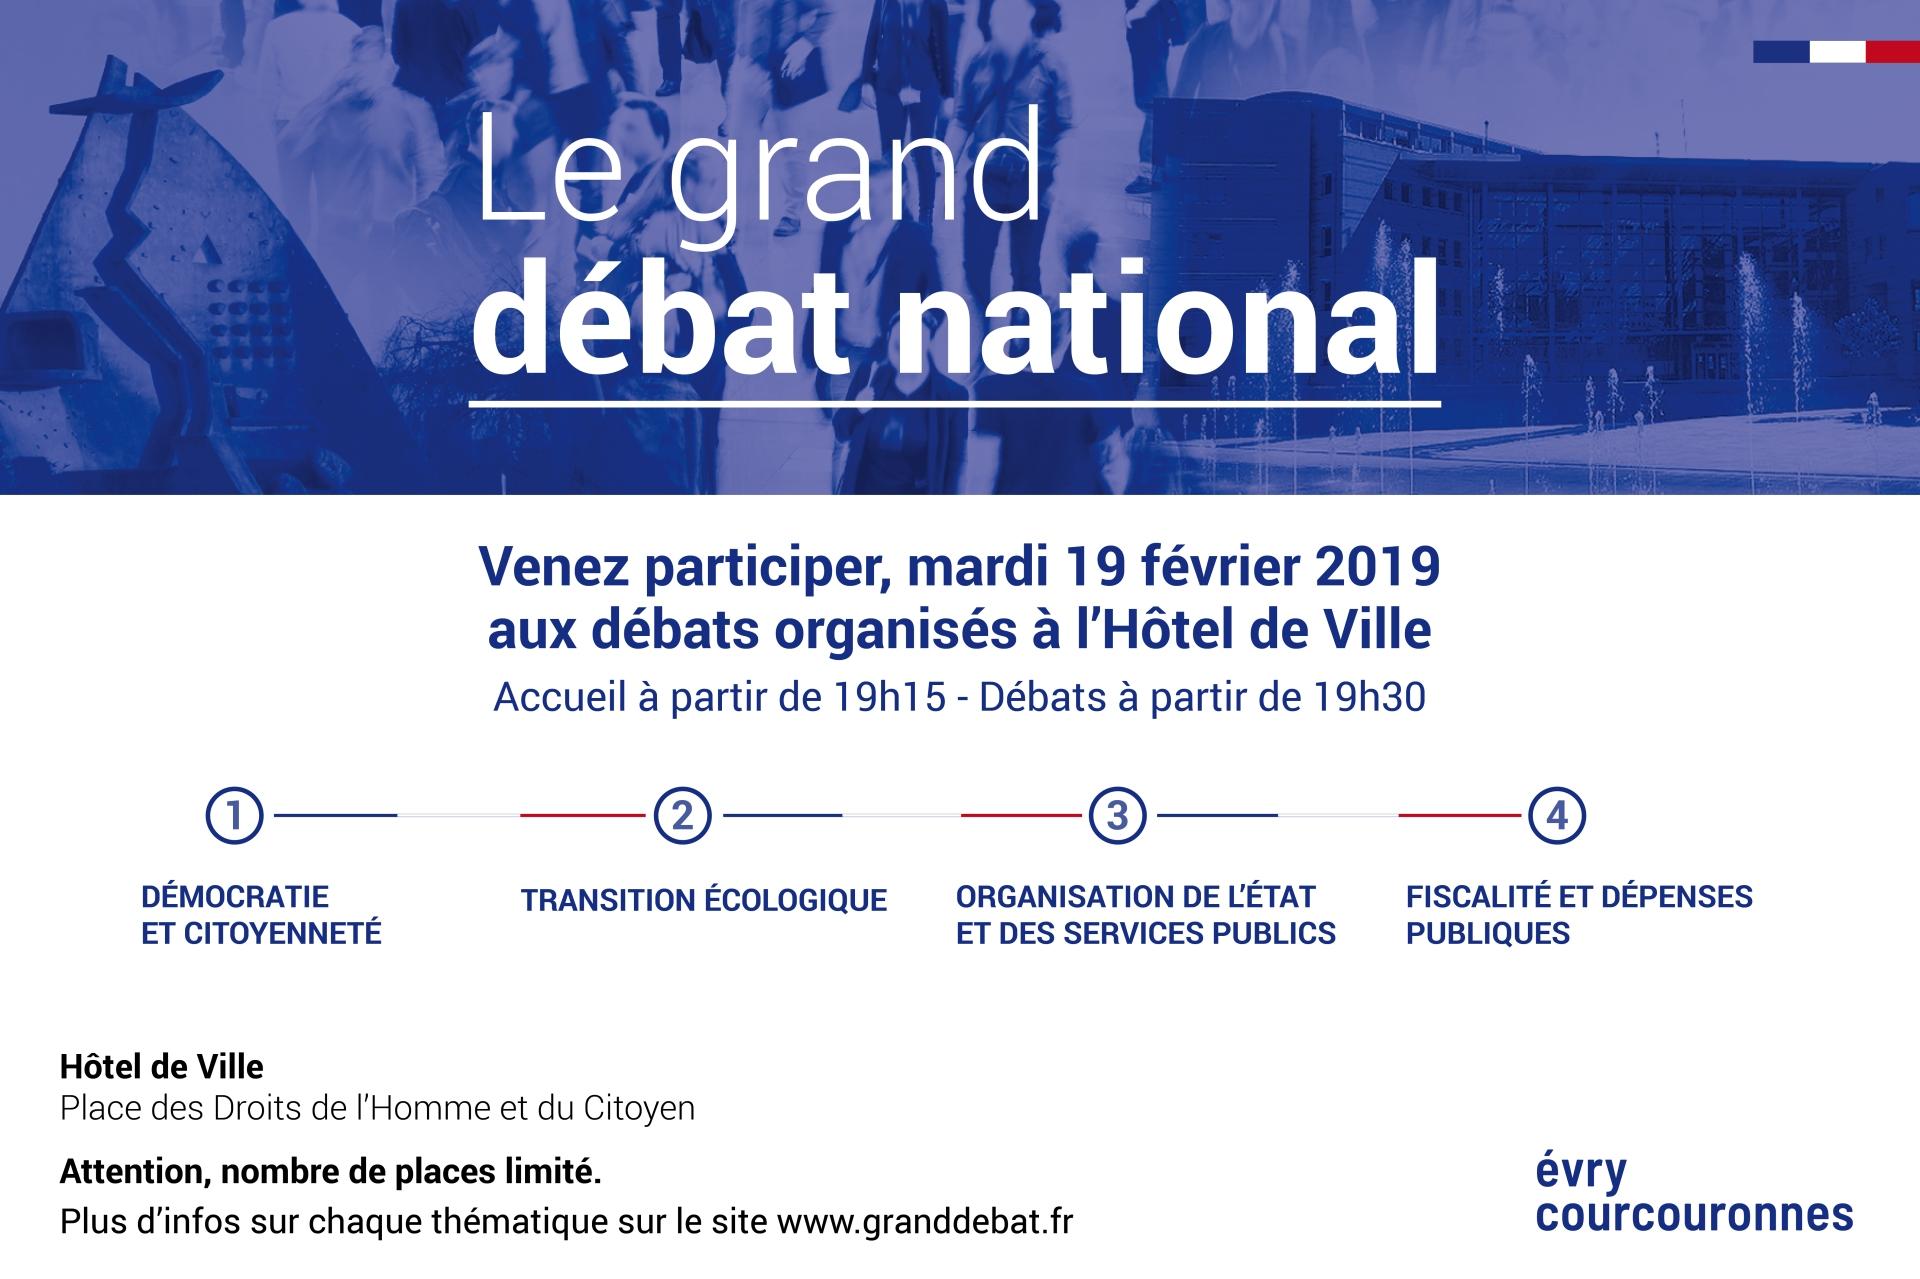 Le Grand Débat National 60x40.jpg